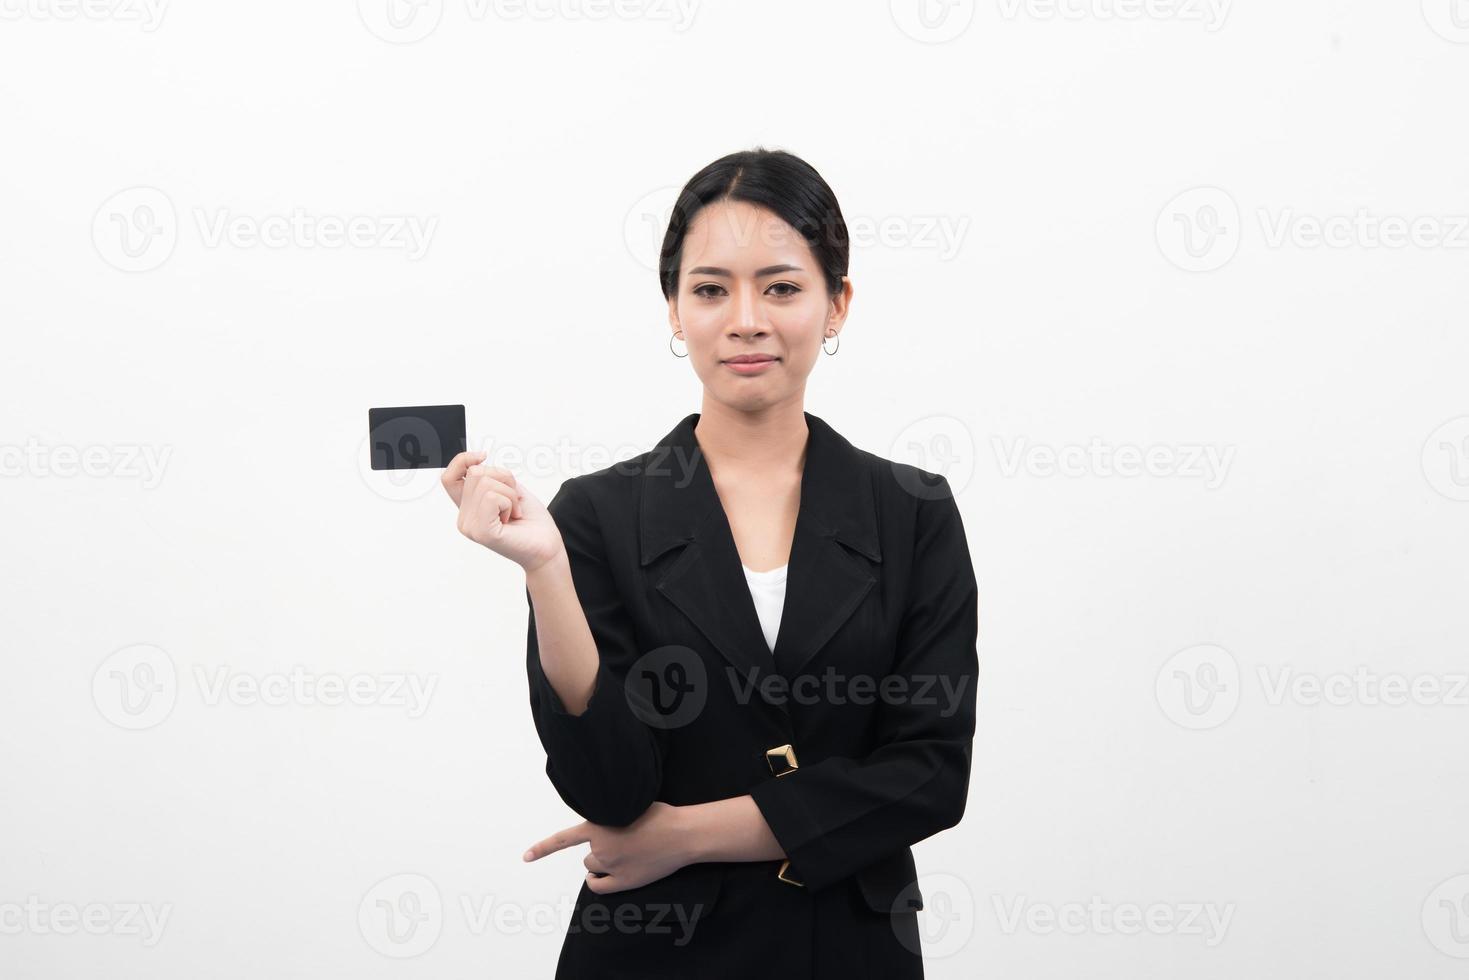 portret van jonge glimlachende Aziatische zakenvrouw met lege creditcard foto